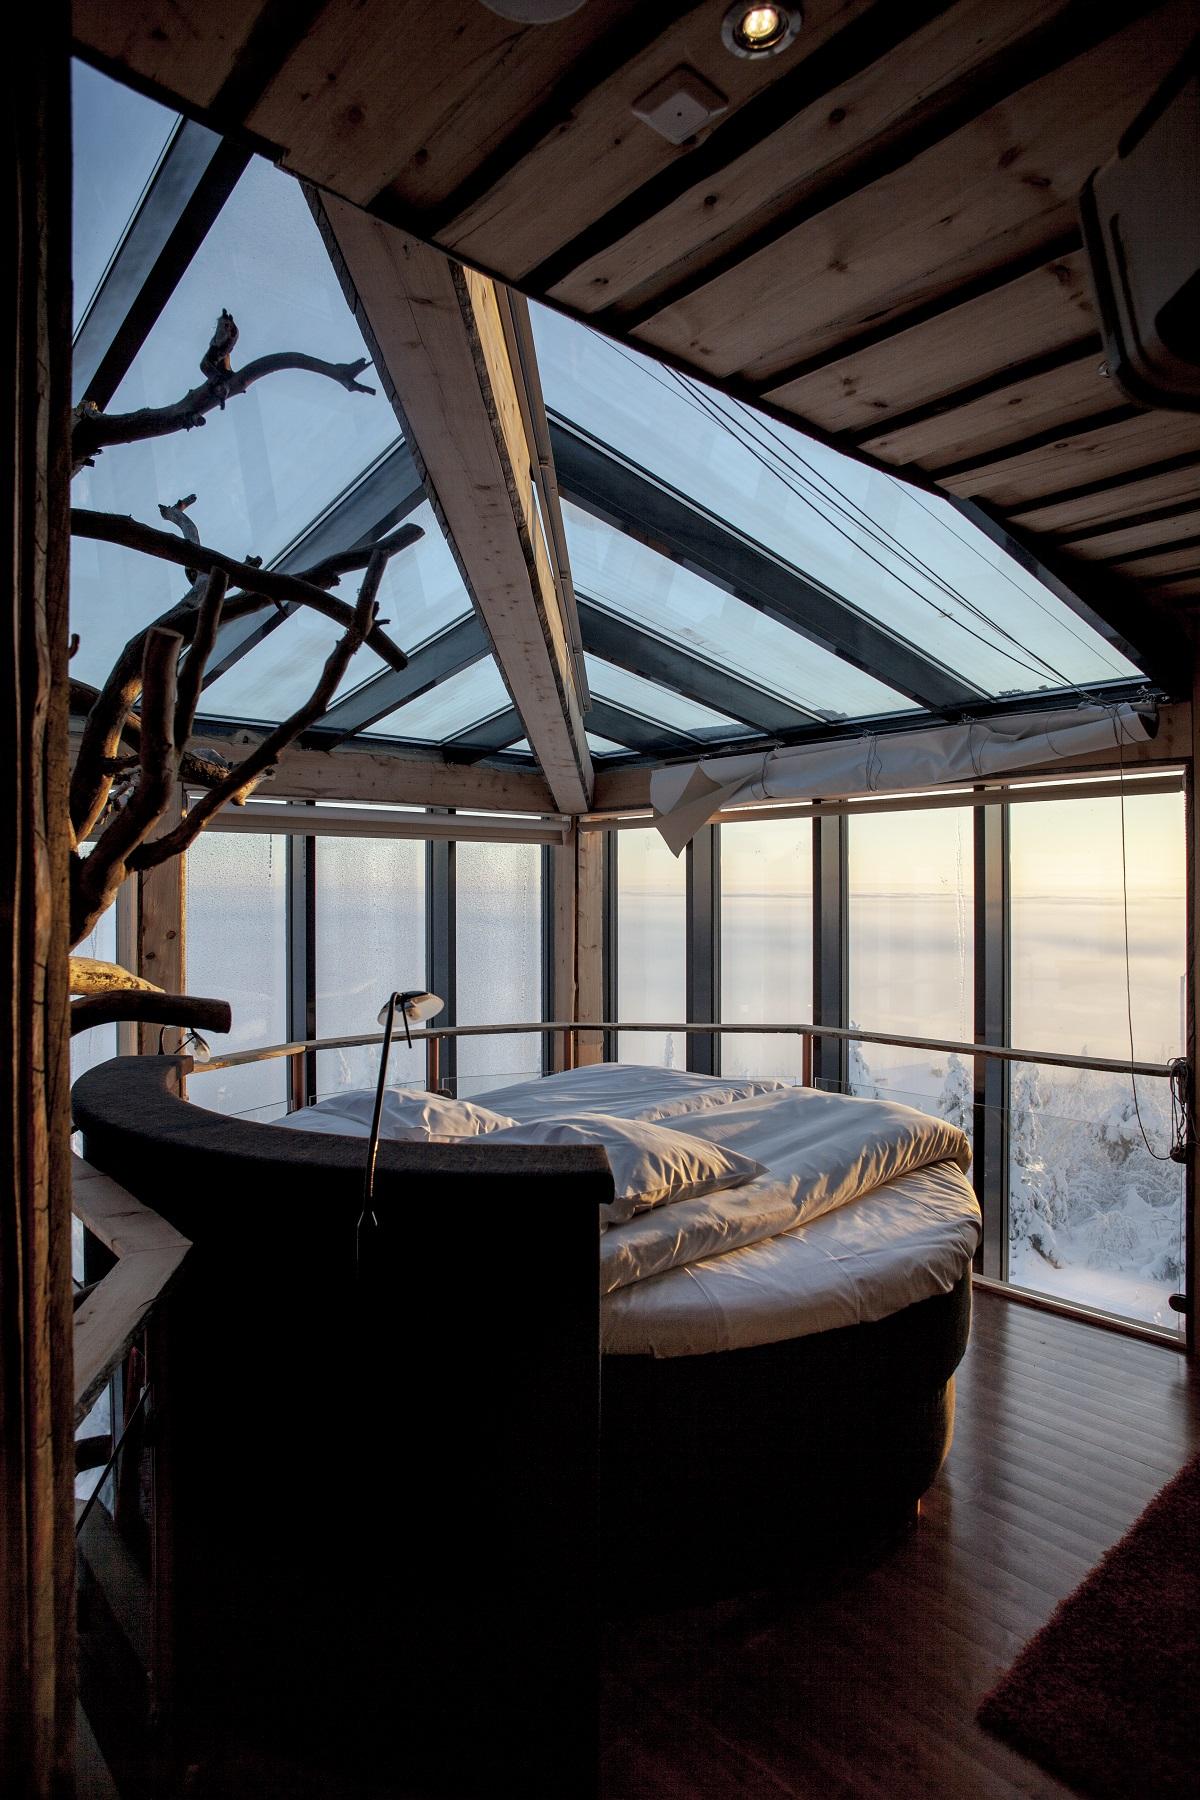 Veranda Metal Et Verre 25 cool bedroom designs to dream about at night